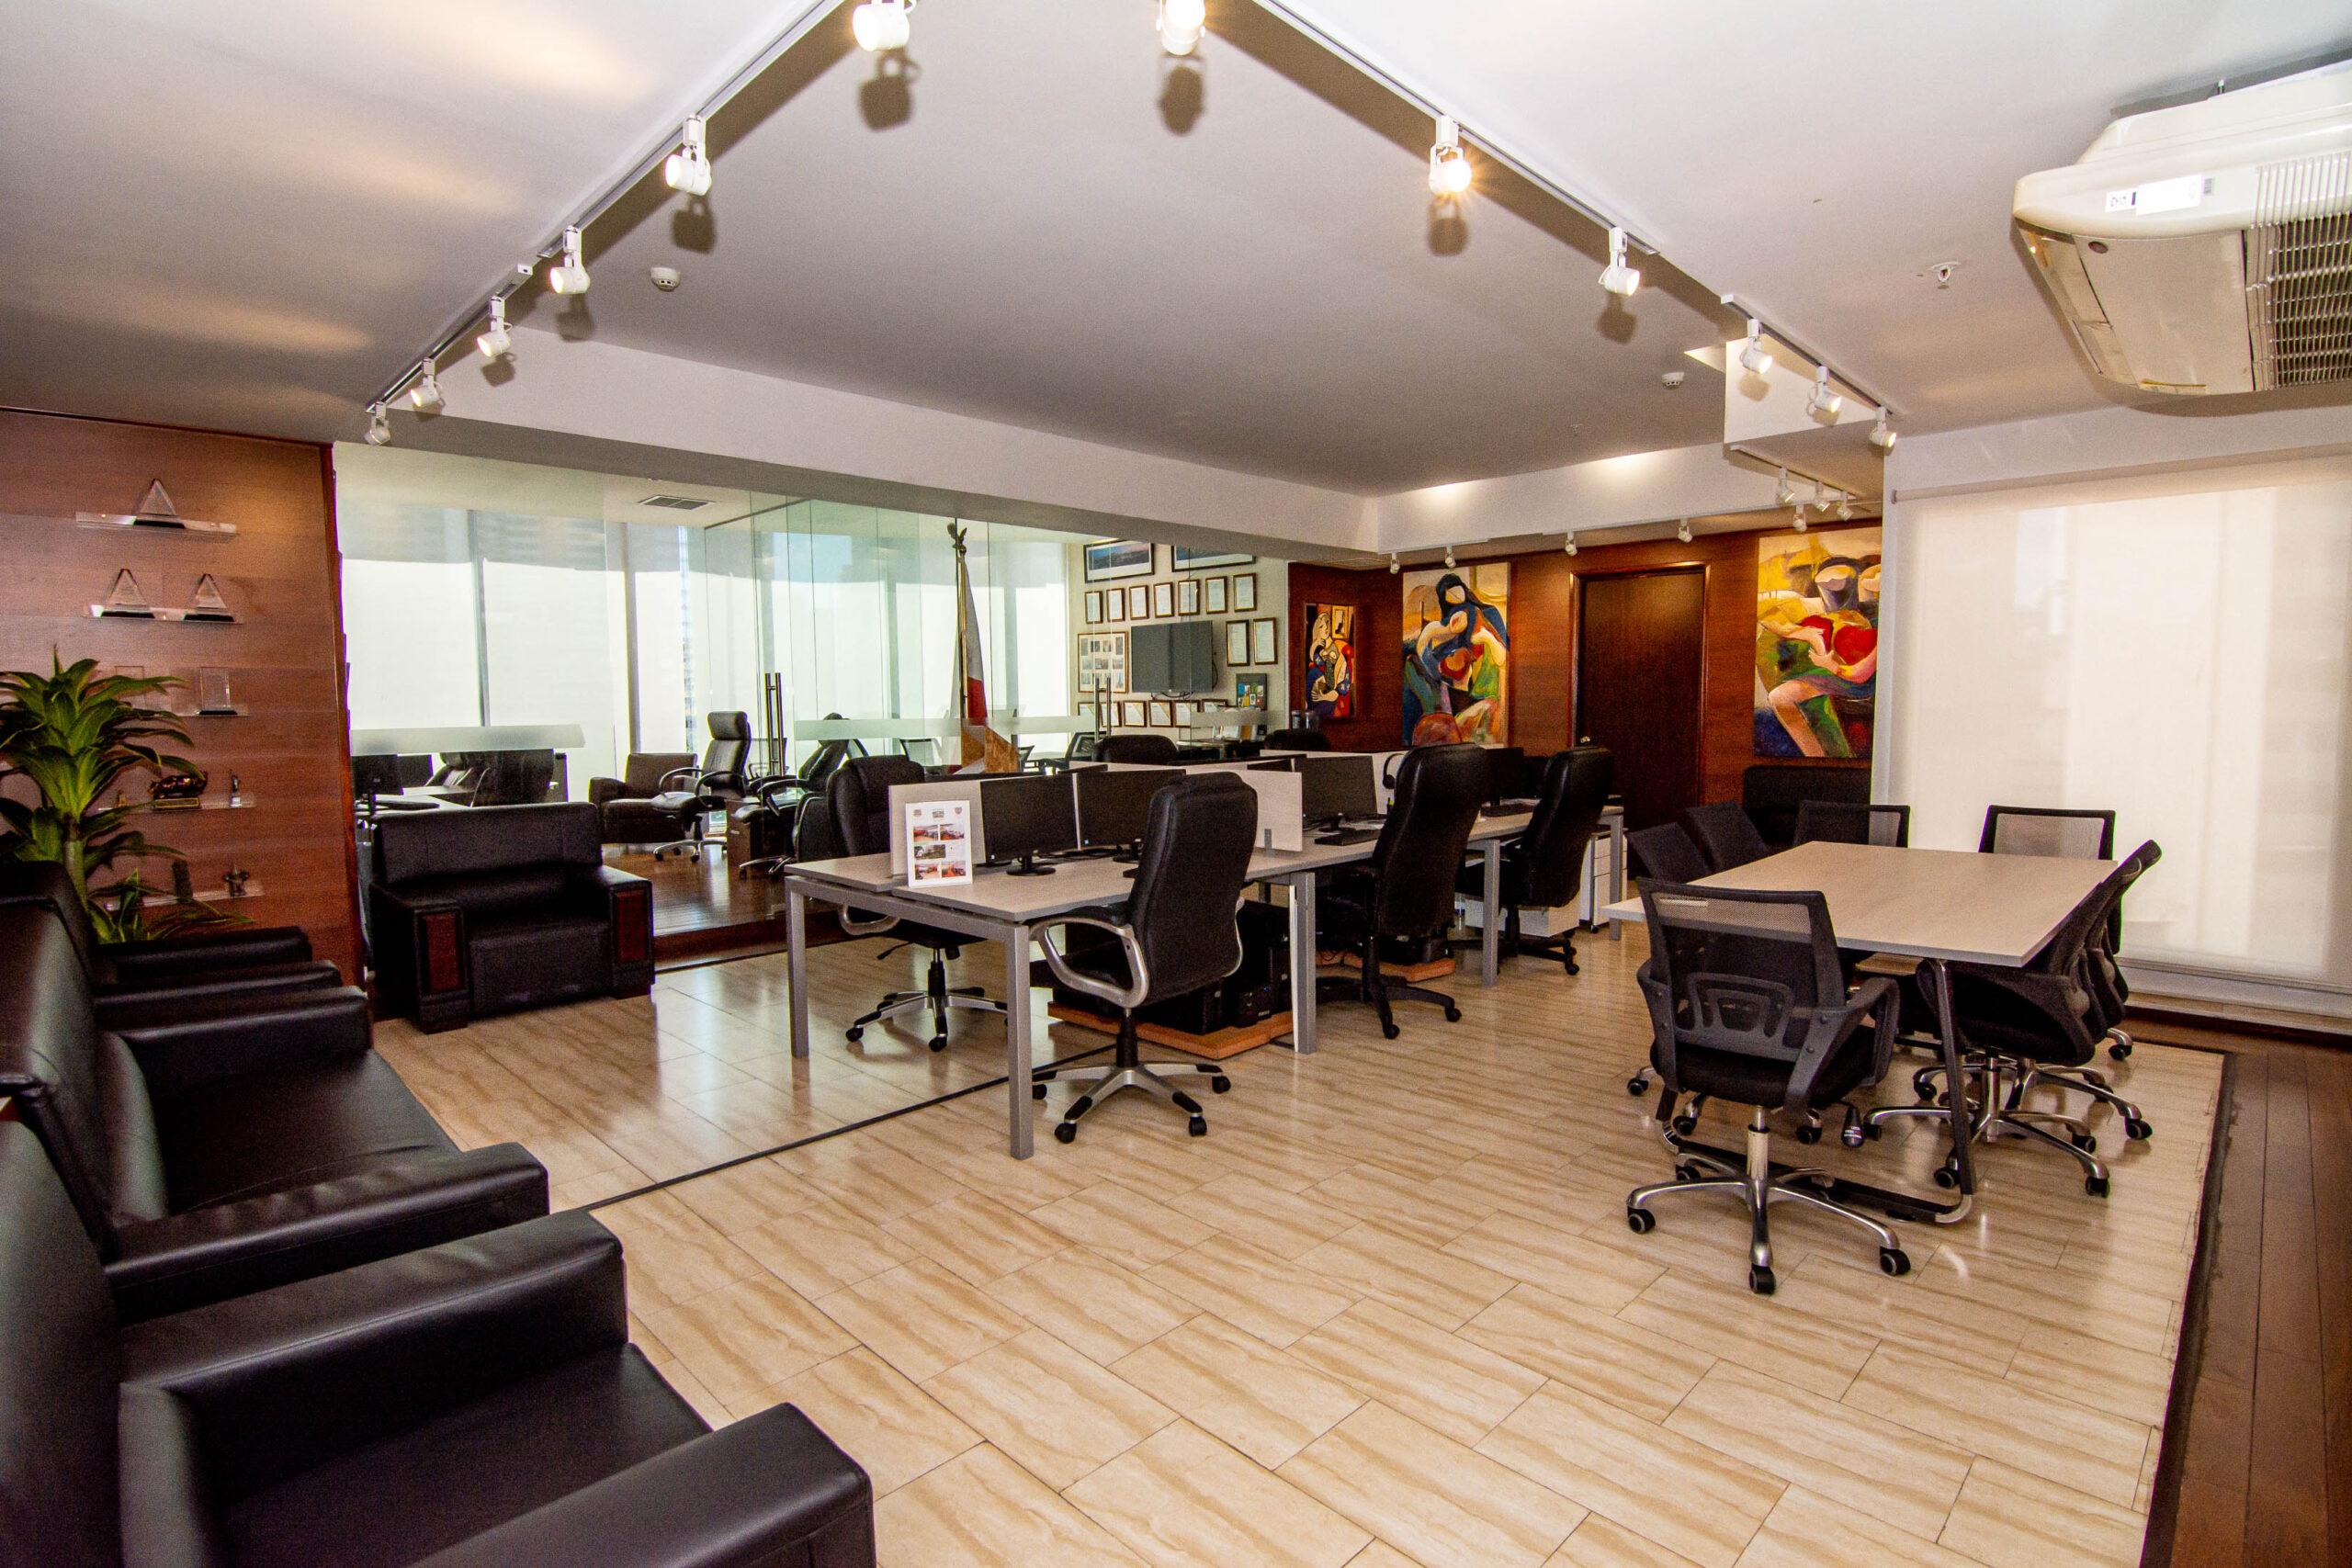 Oficina de Panama Real Estate & Investment Consultants, Corp. y Panama Finance Law & Co. – Tour Virtual 360